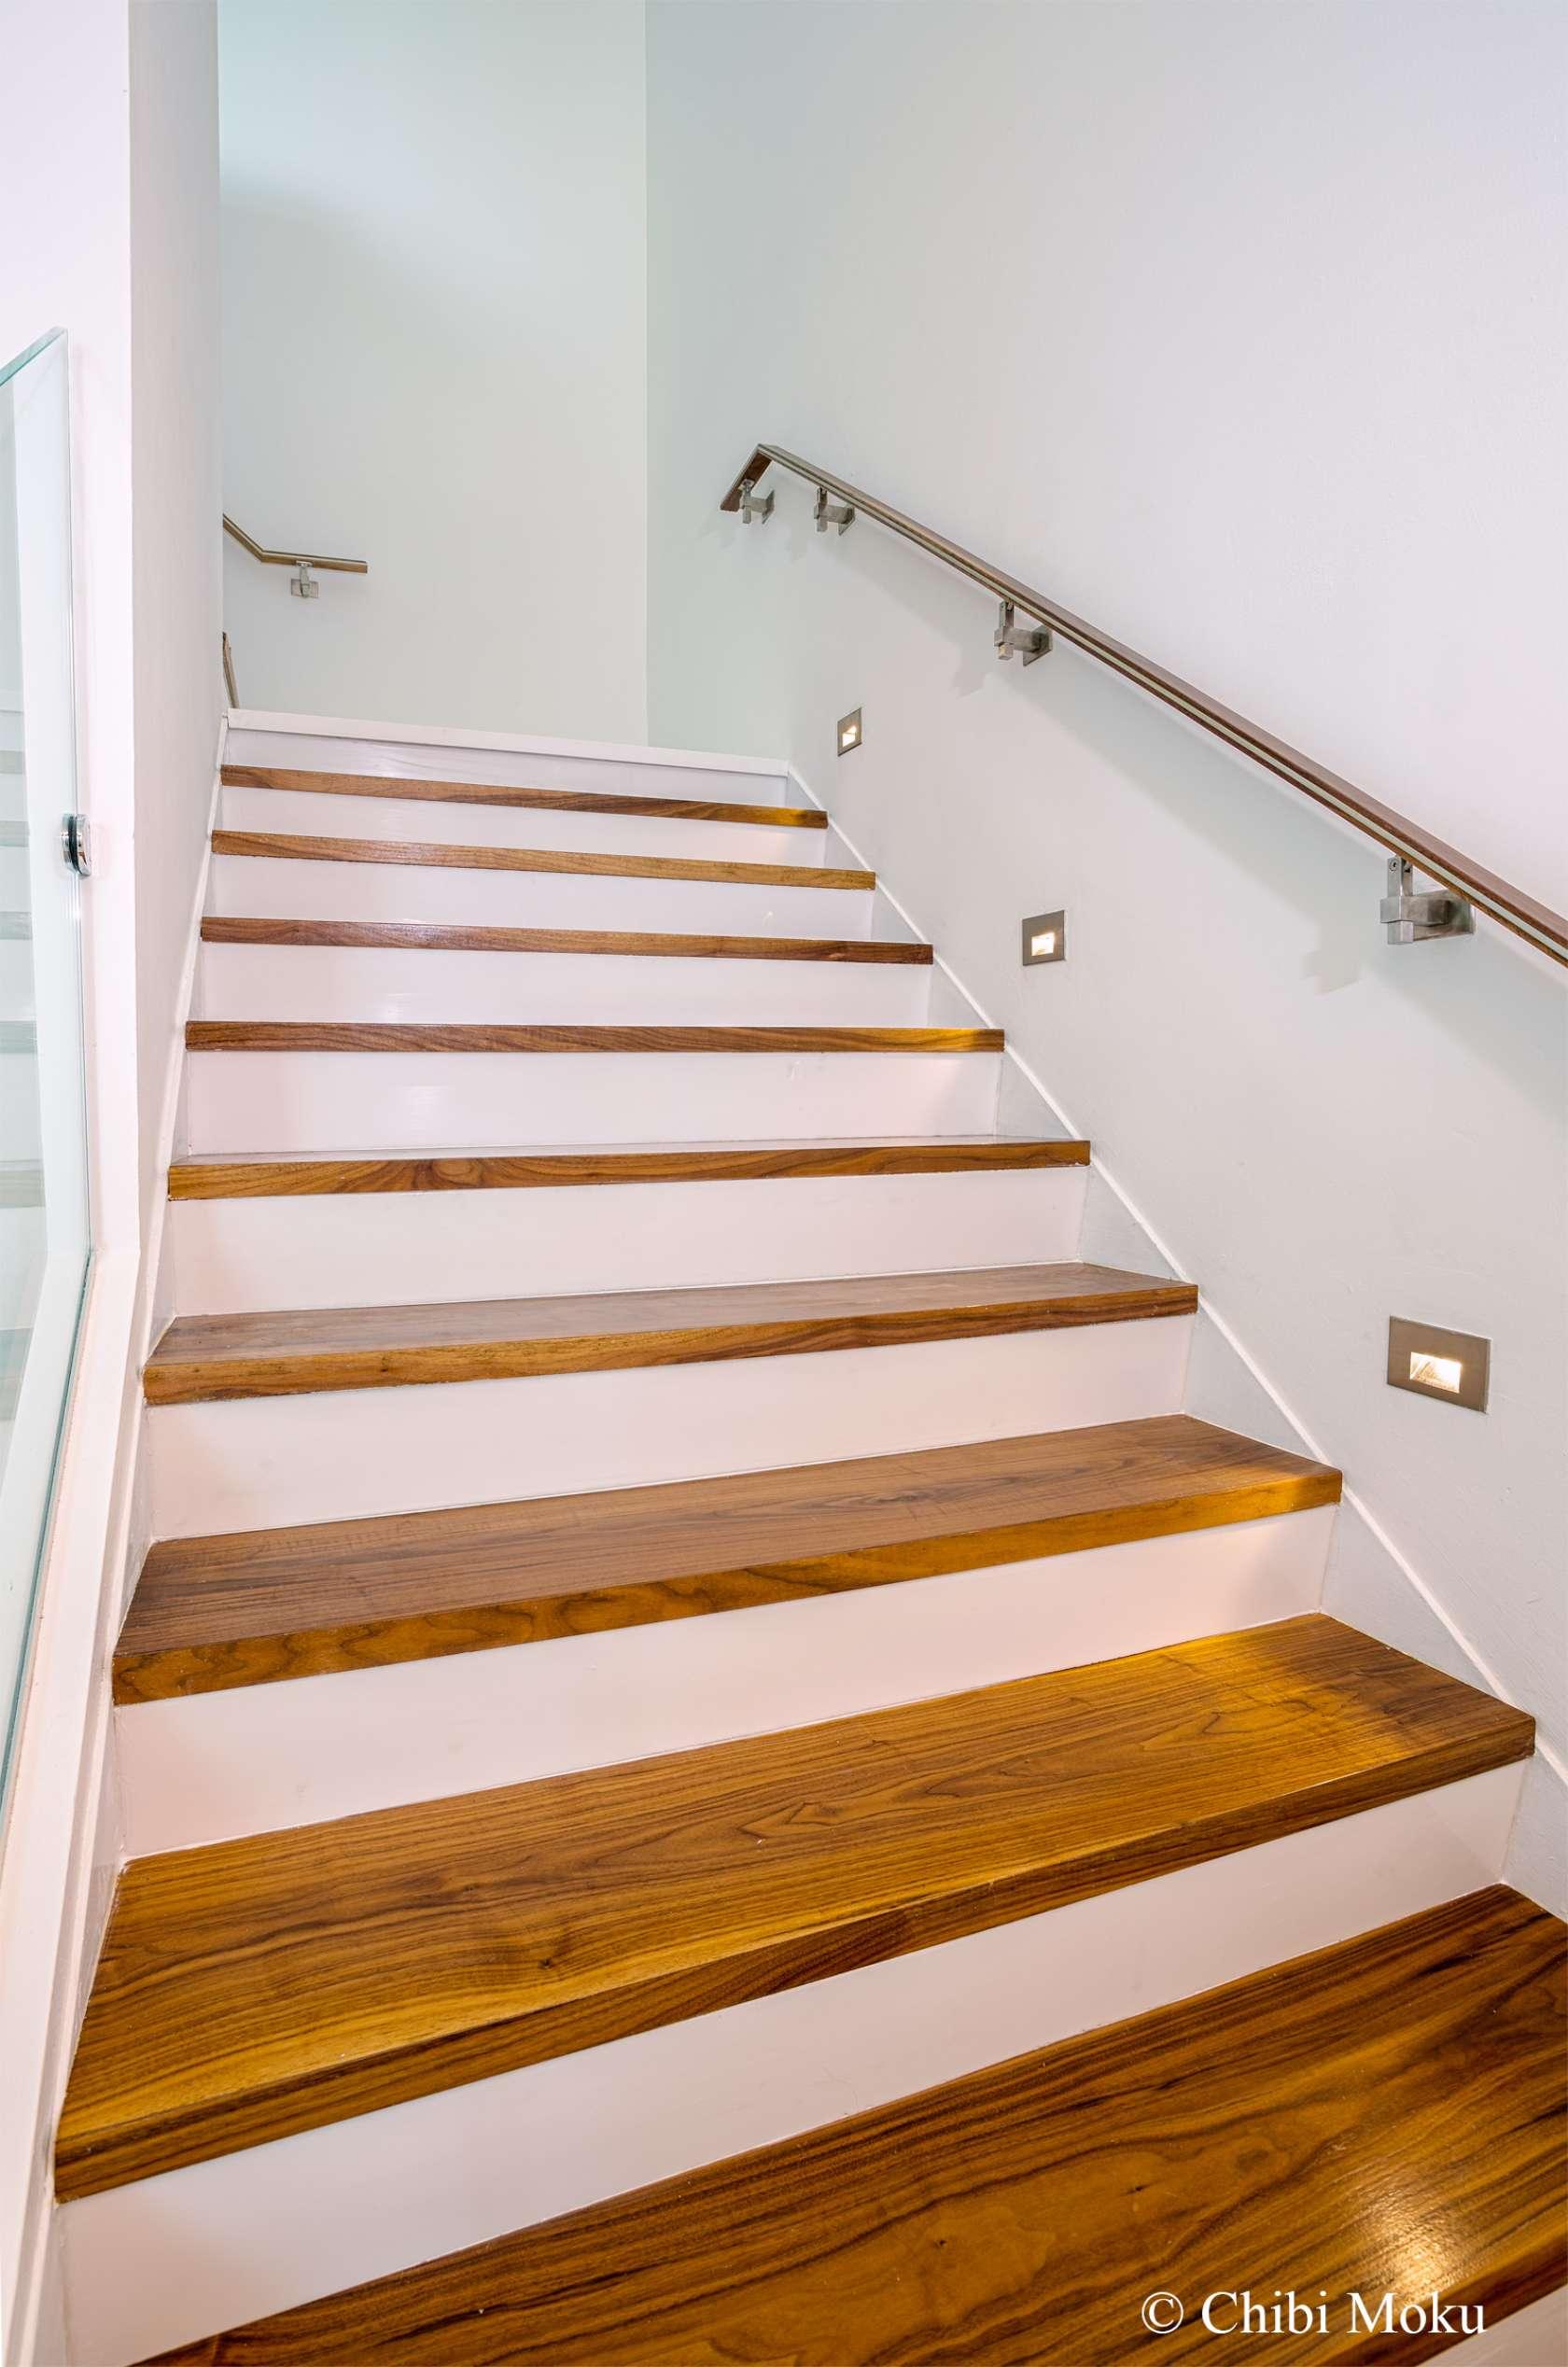 mila design penthouse 7 at 4 midtown miami fl arcdog. Black Bedroom Furniture Sets. Home Design Ideas